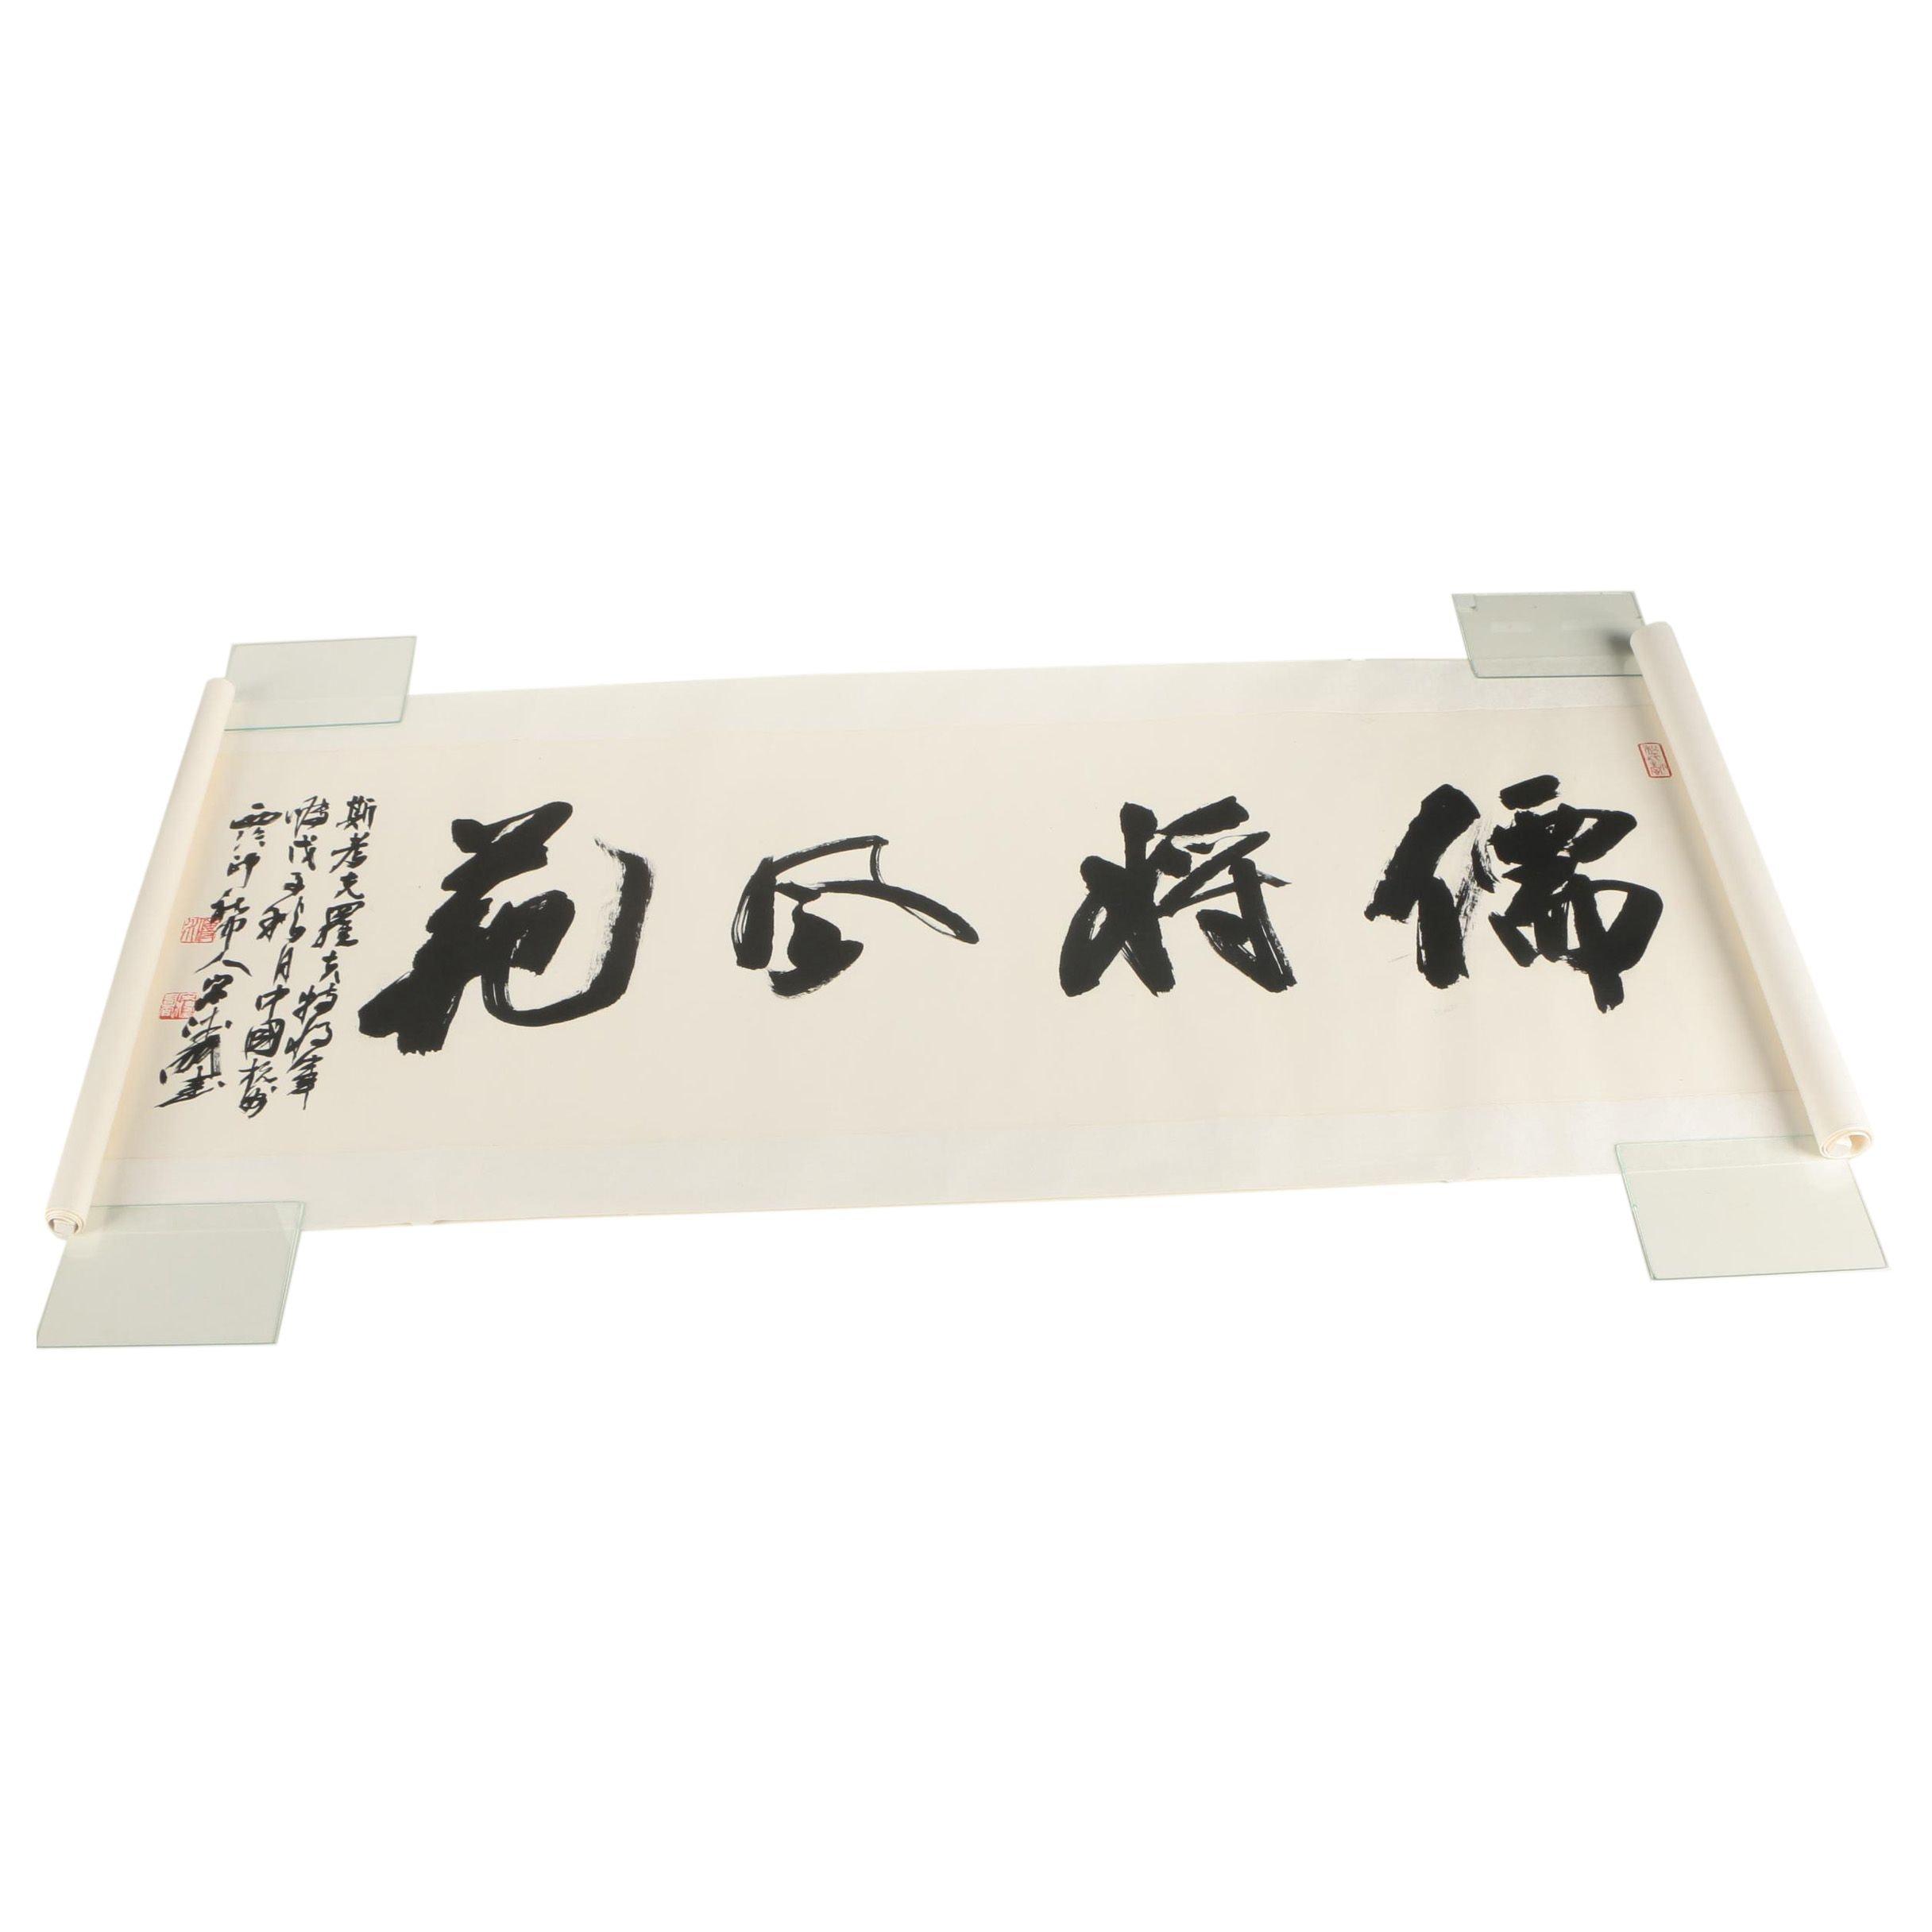 East Asian Calligraphy on Silk Brocade Scroll